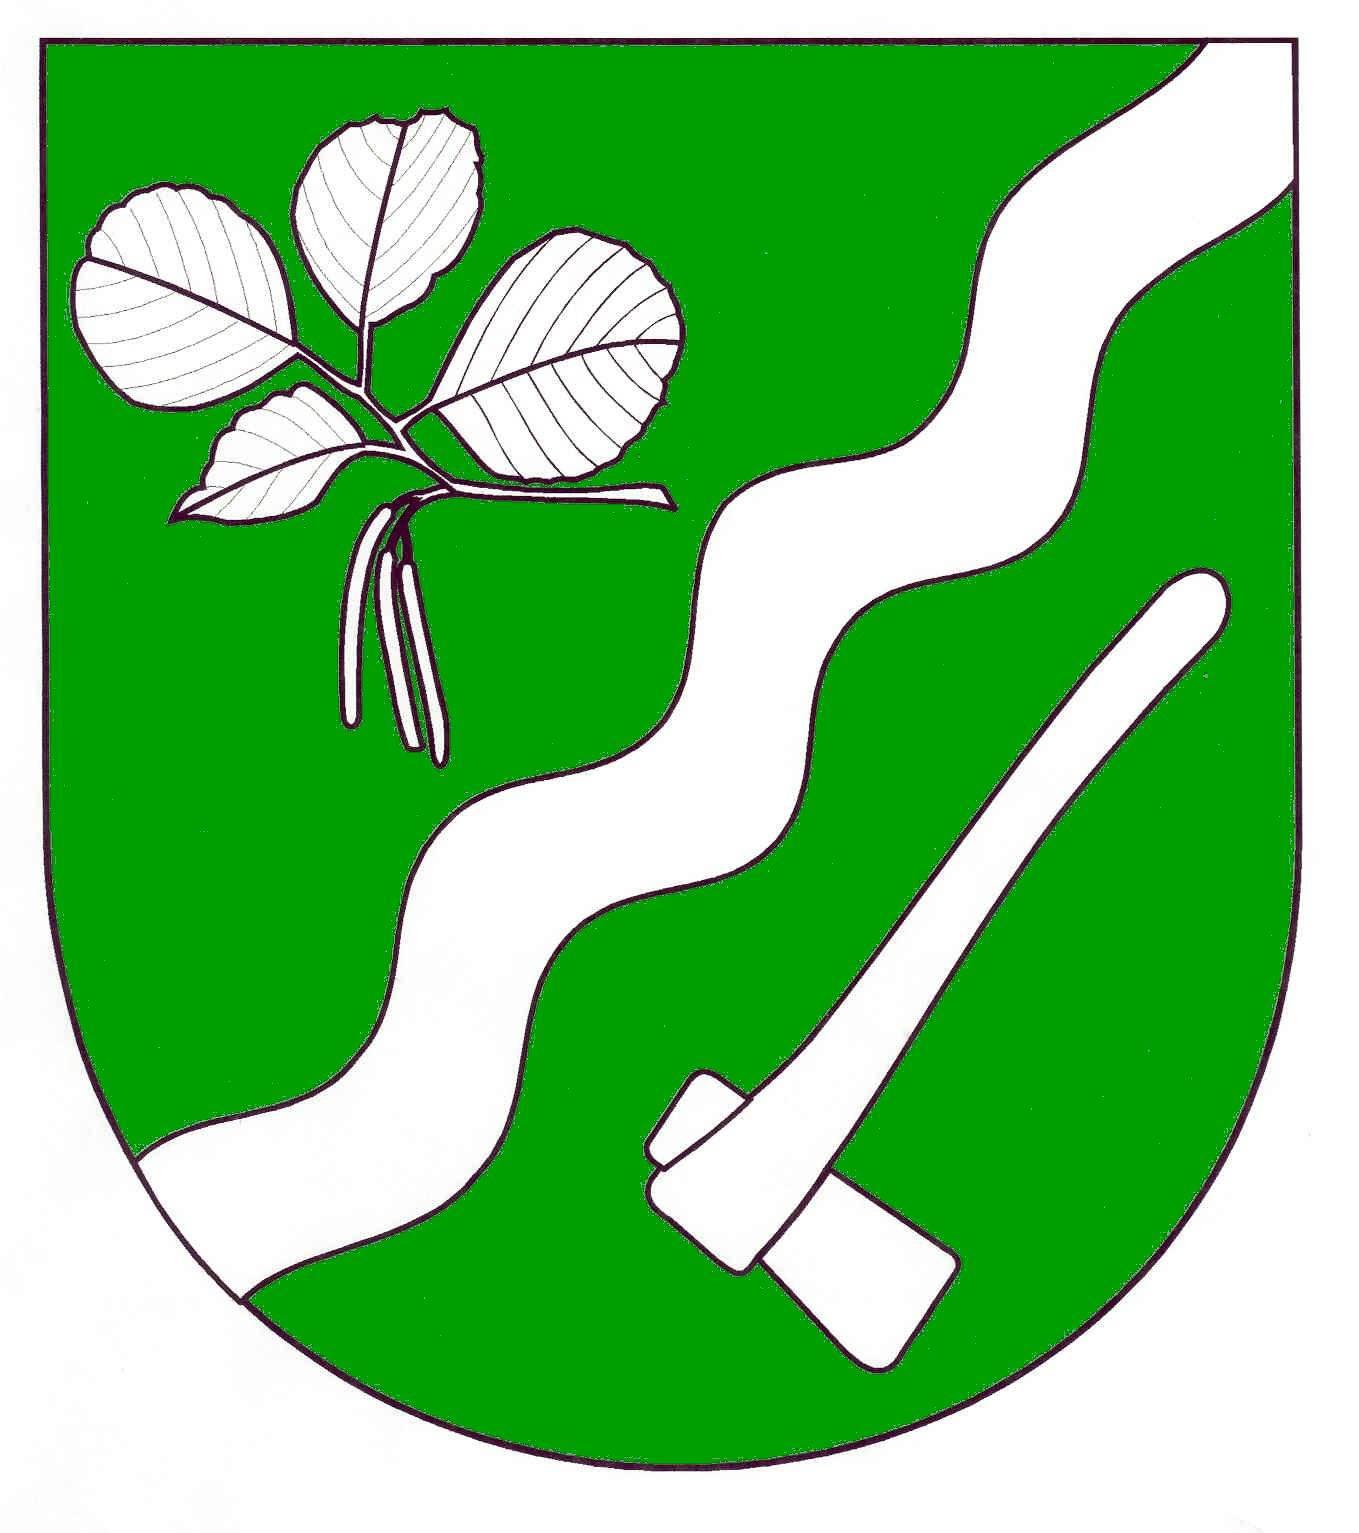 Wappen GemeindeEllerdorf, Kreis Rendsburg-Eckernförde